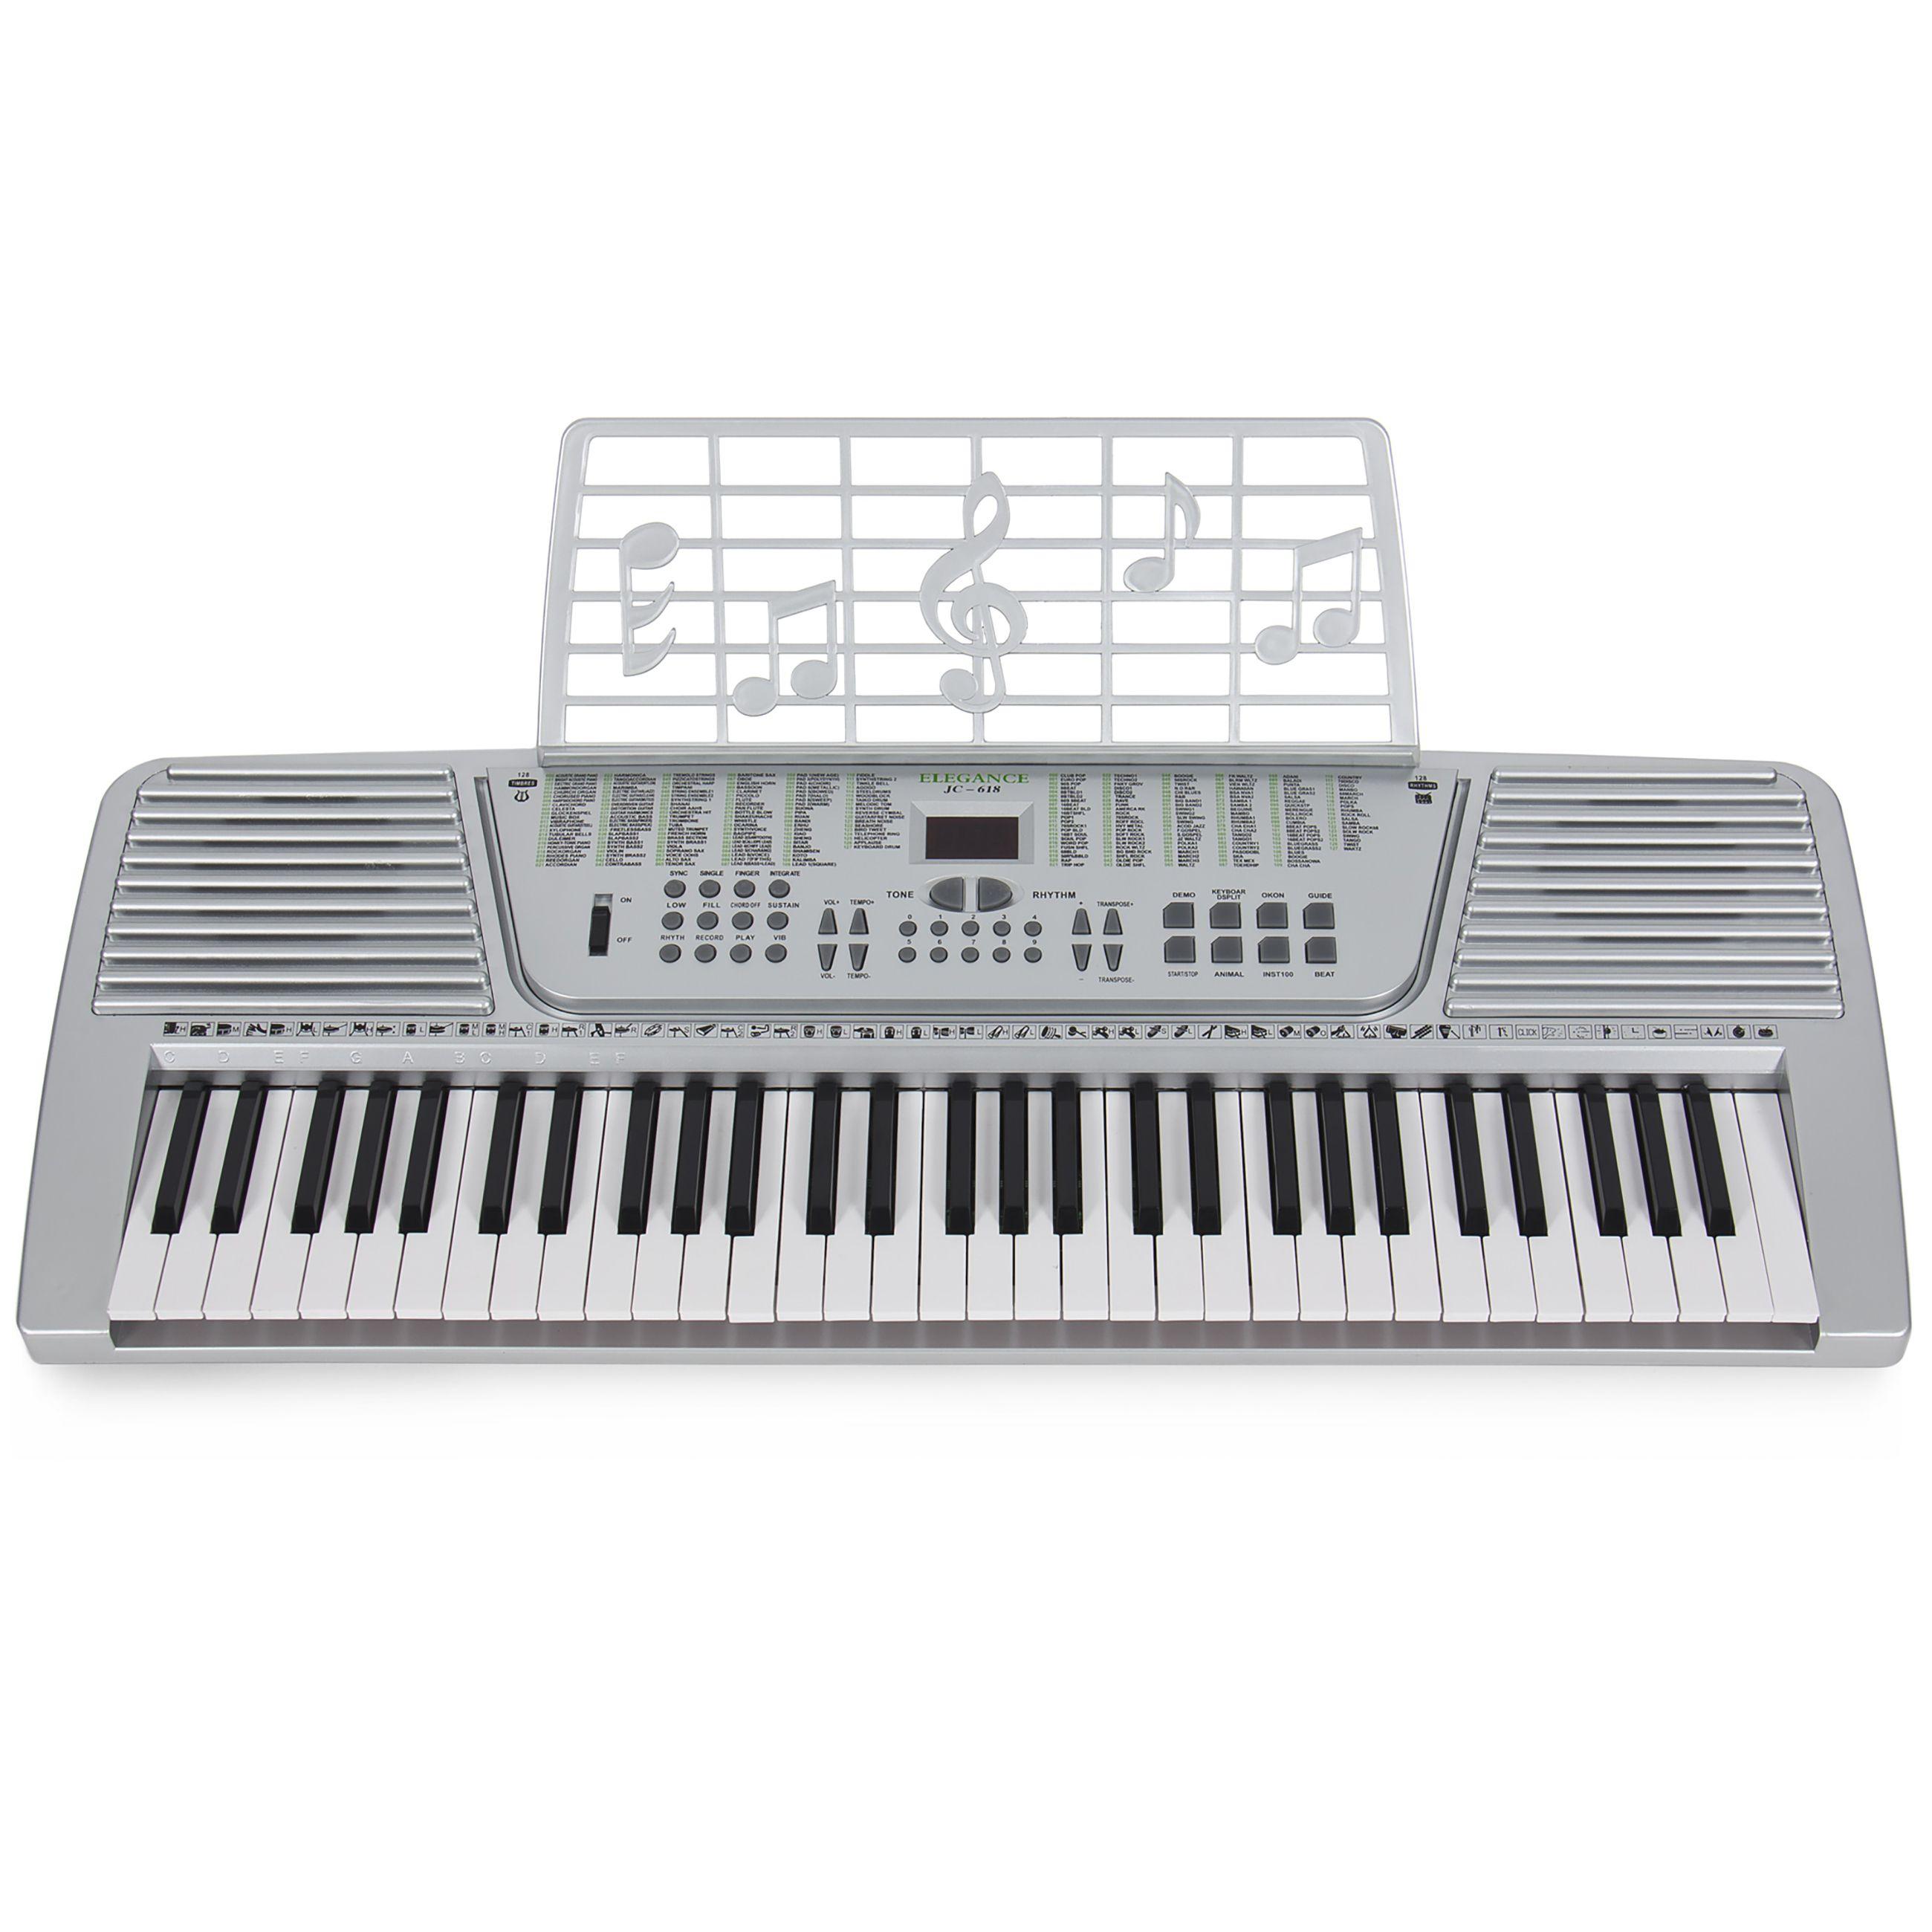 new silver 61 key electronic music keyboard electric piano organ